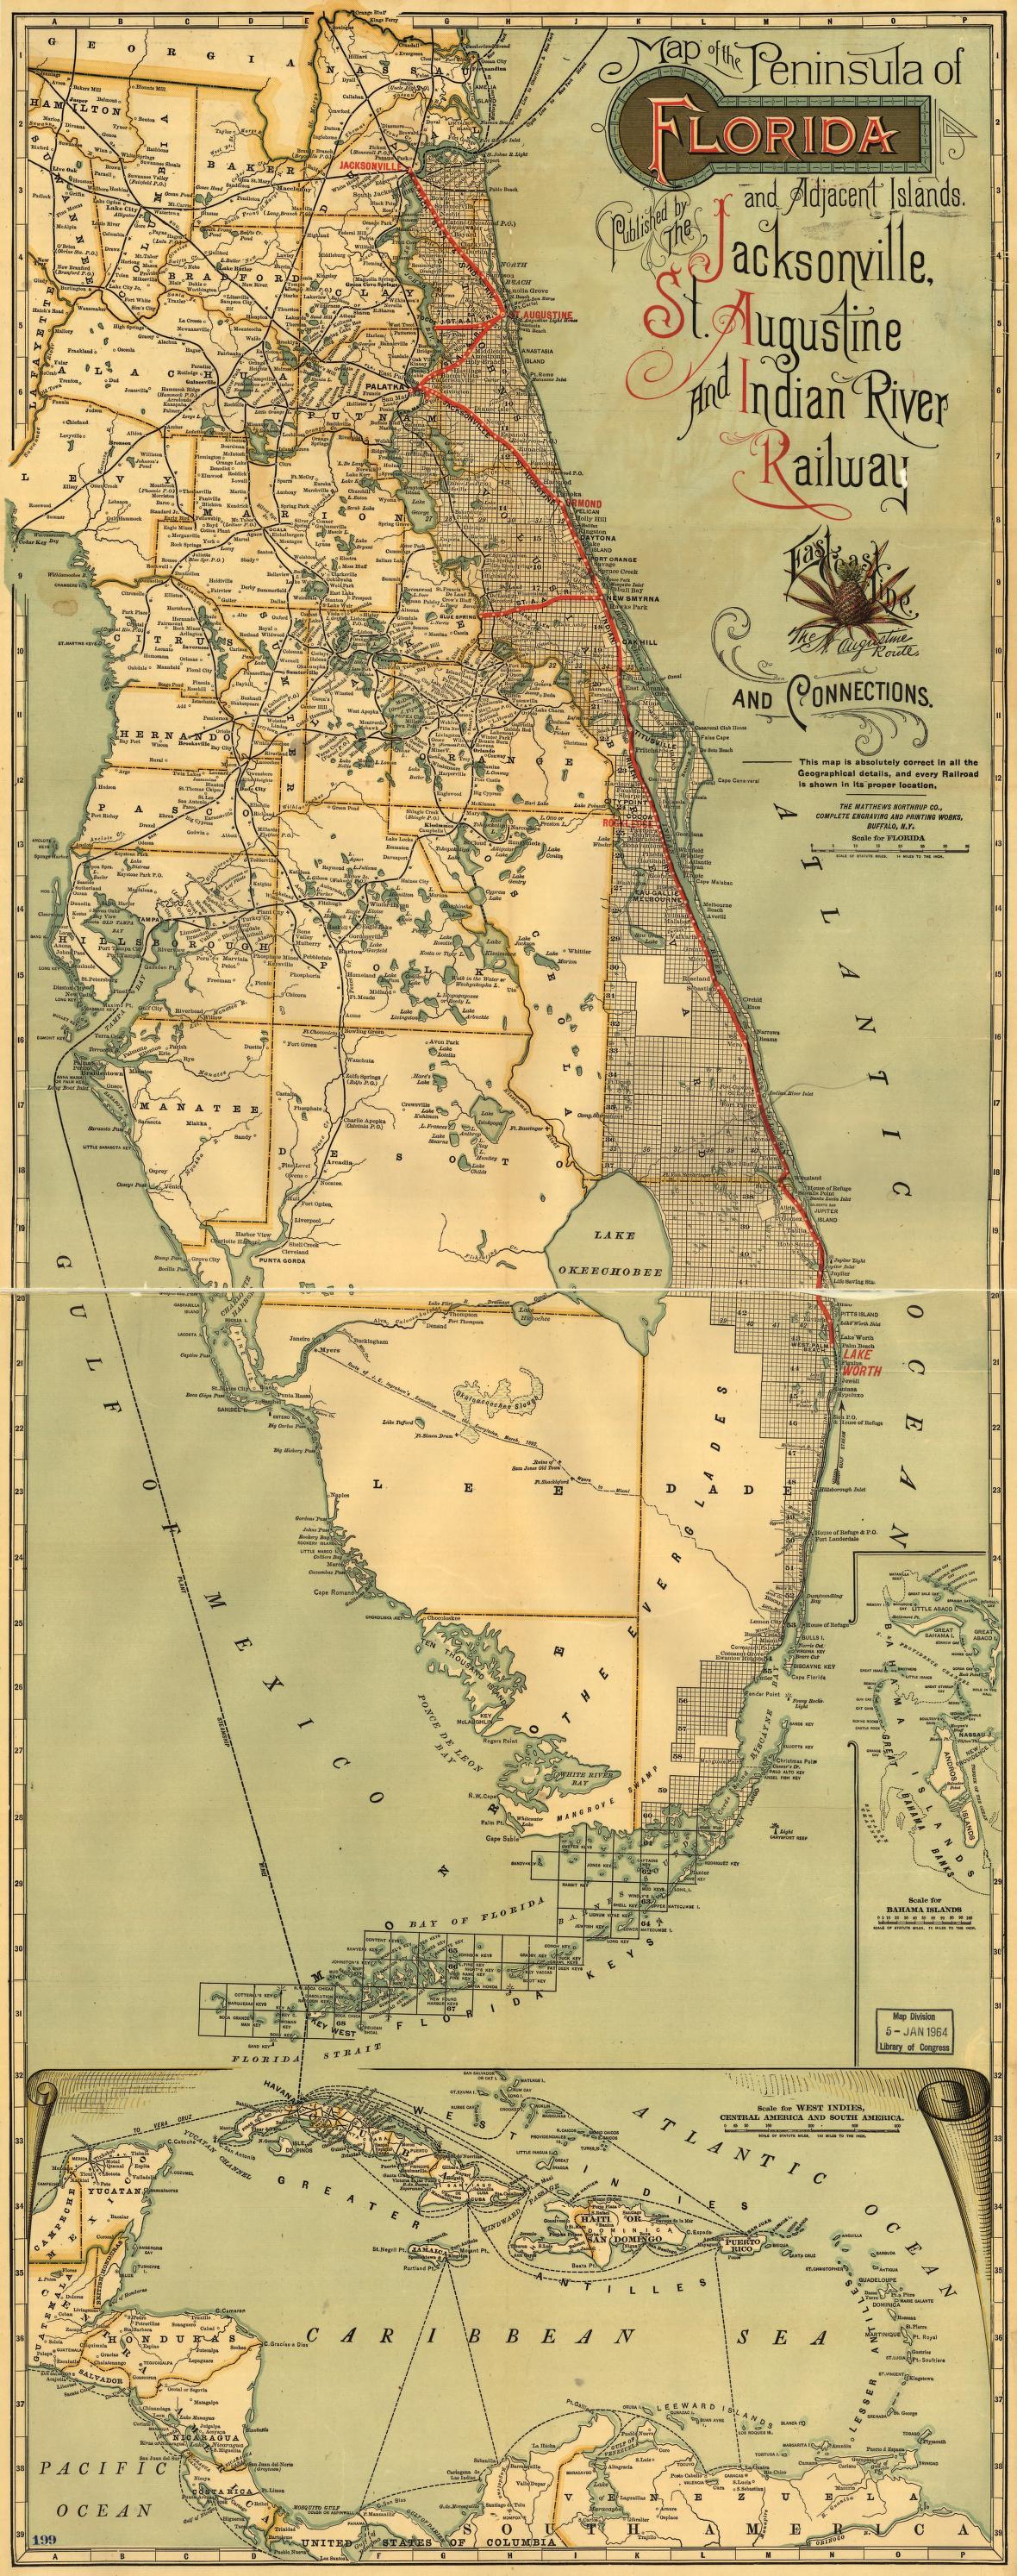 Map Of The Peninsula Of Florida And Adjacent Islands